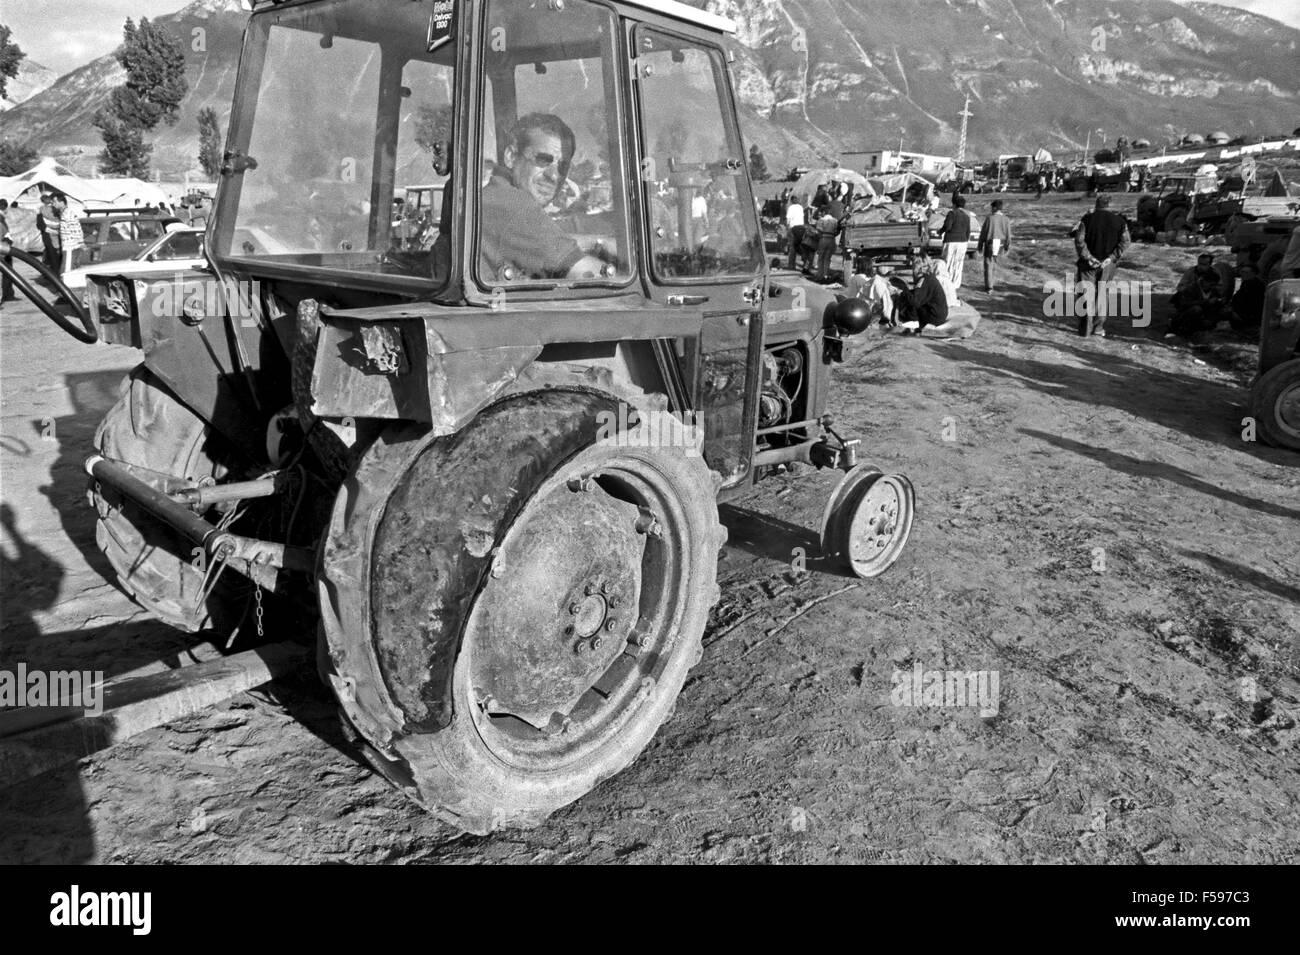 war in ex Yugoslavia, Kosovo crisis, Kosovar  refugees camp in Kukes (Albania), april 1999 Stock Photo